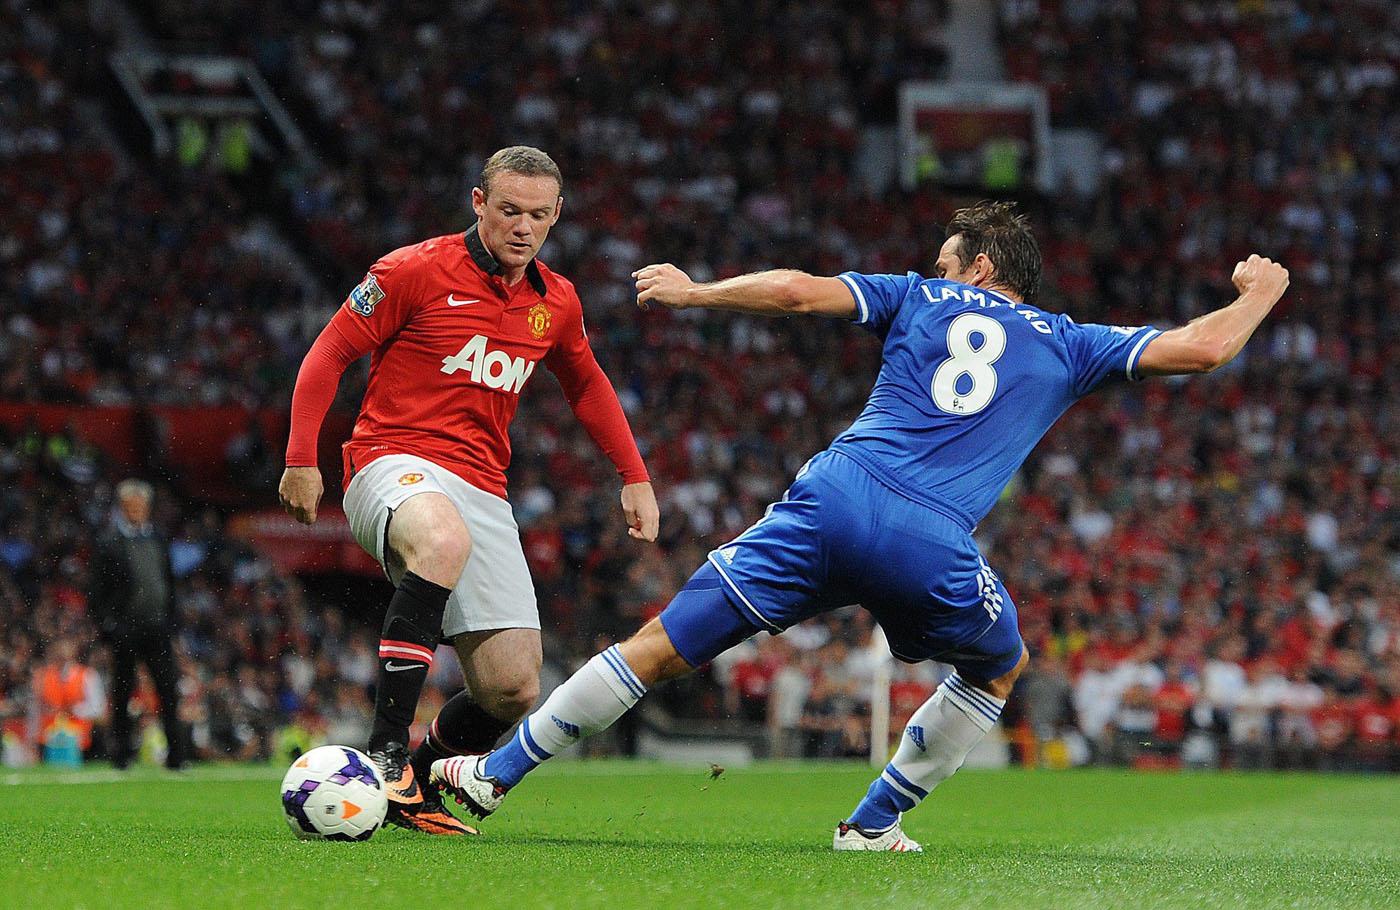 Manchester United vs. Chelsea FC